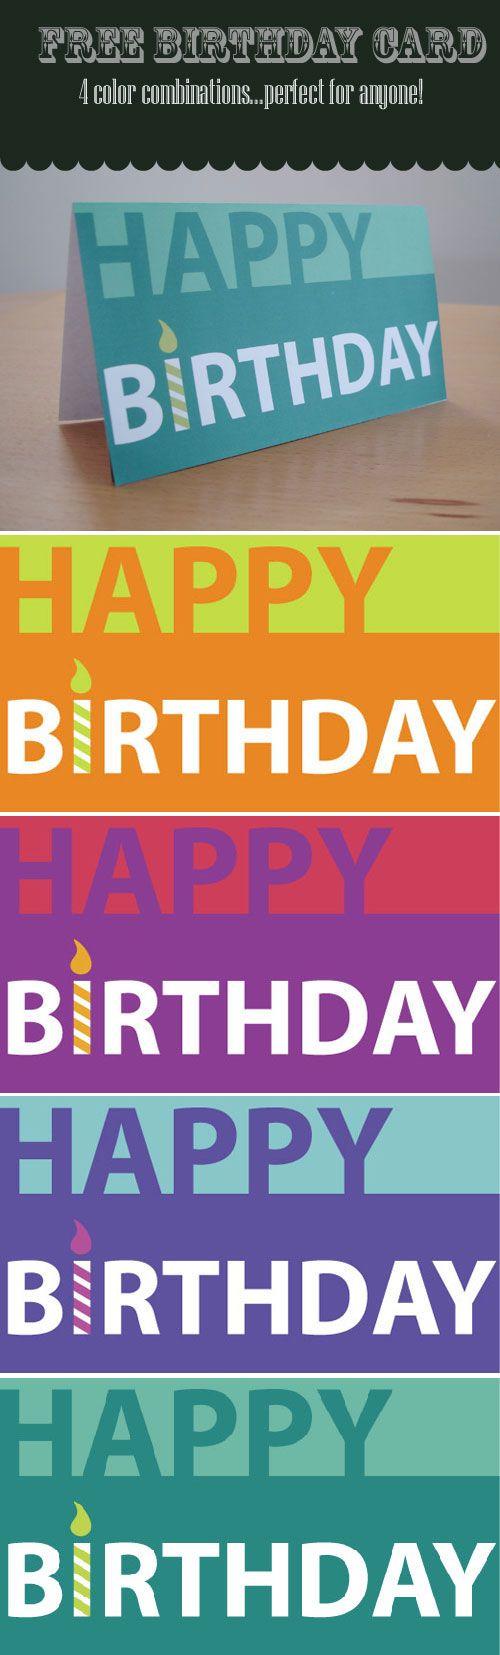 Free Printable Birthday Cards Free Printable Birthday Cards Birthday Cards For Him Birthday Card Printable